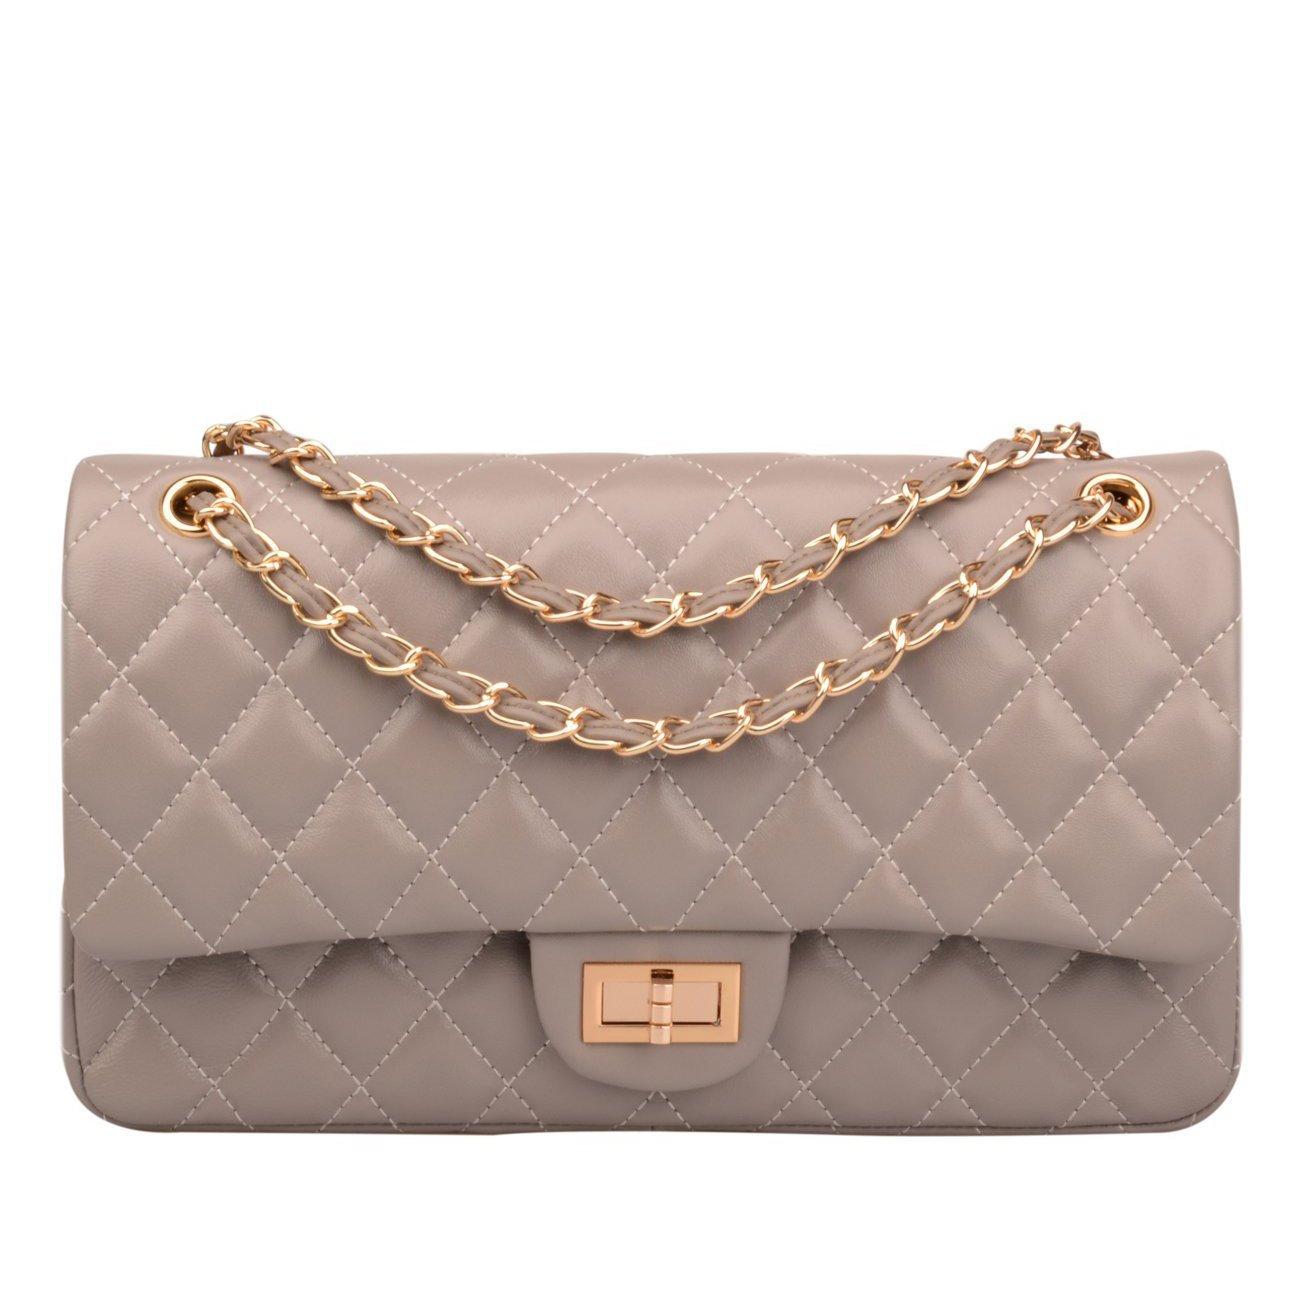 5d85e890380e Ainifeel Women s Genuine Leather Quilted Chain Bag Shoulder Handbags Purse ( Medium